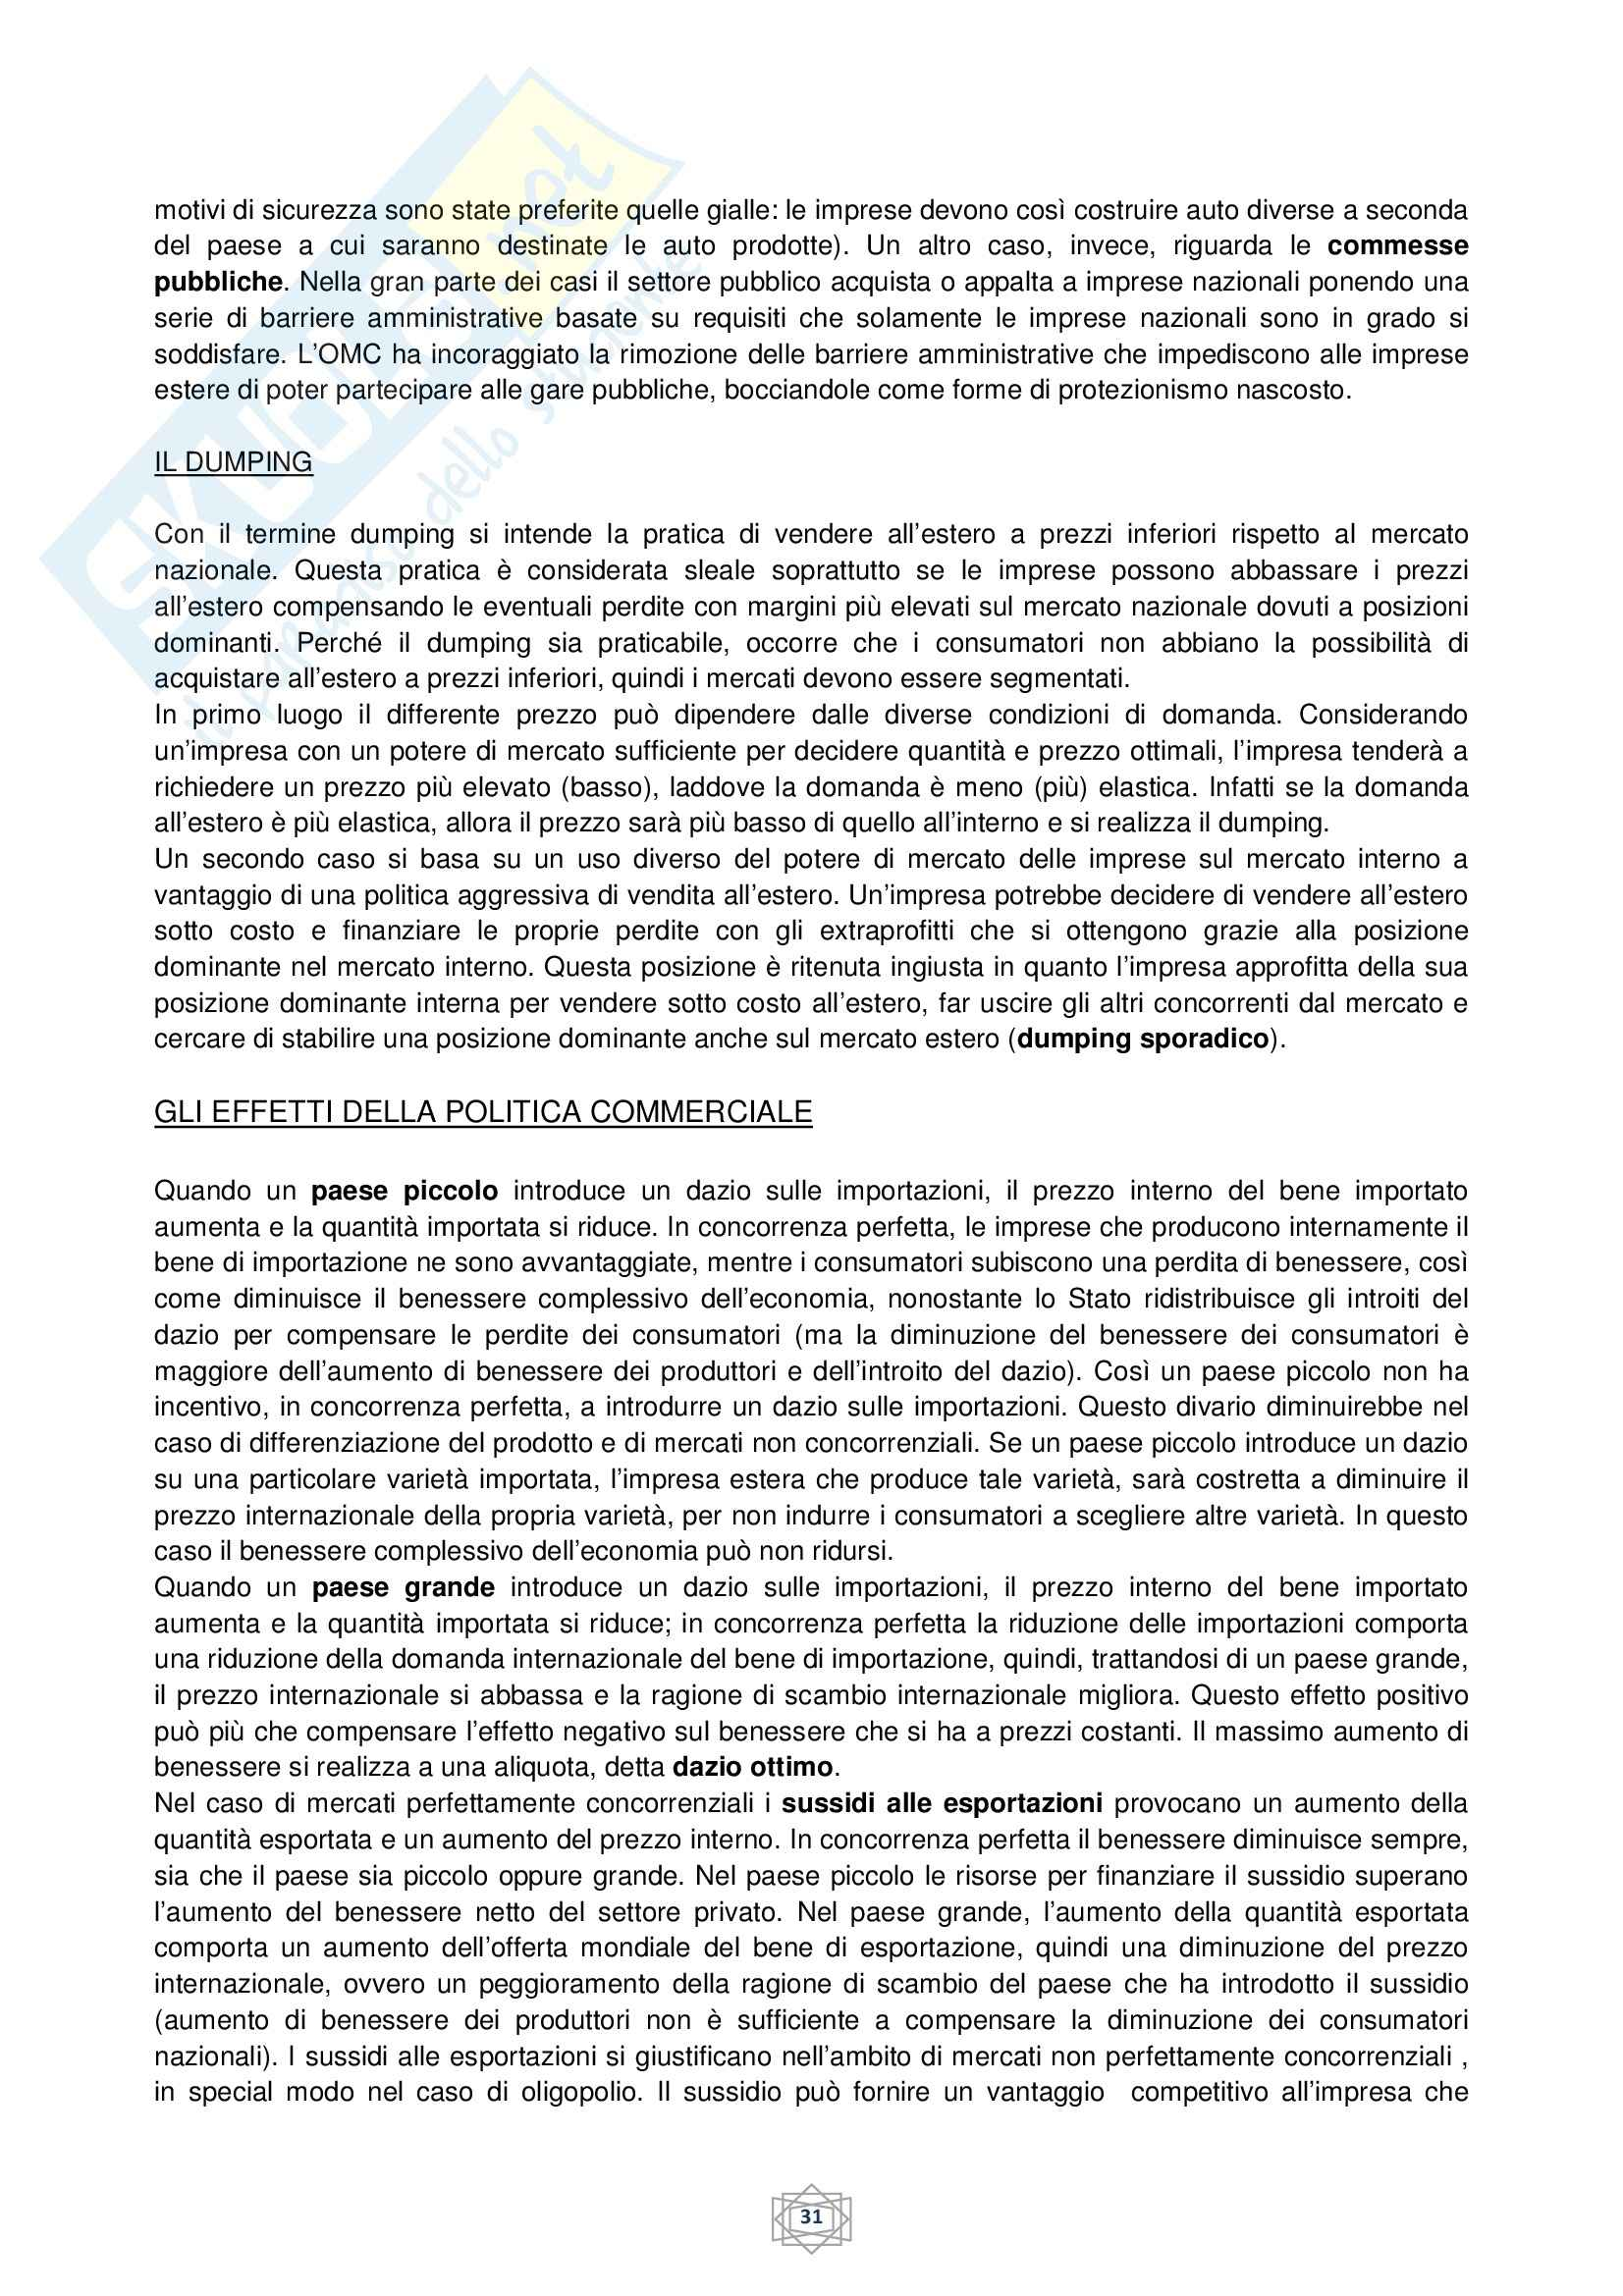 Riassunto esame Economia internazionale, prof. Atzeni, libro consigliato Economia internazionale, di De Arcangelis Pag. 31